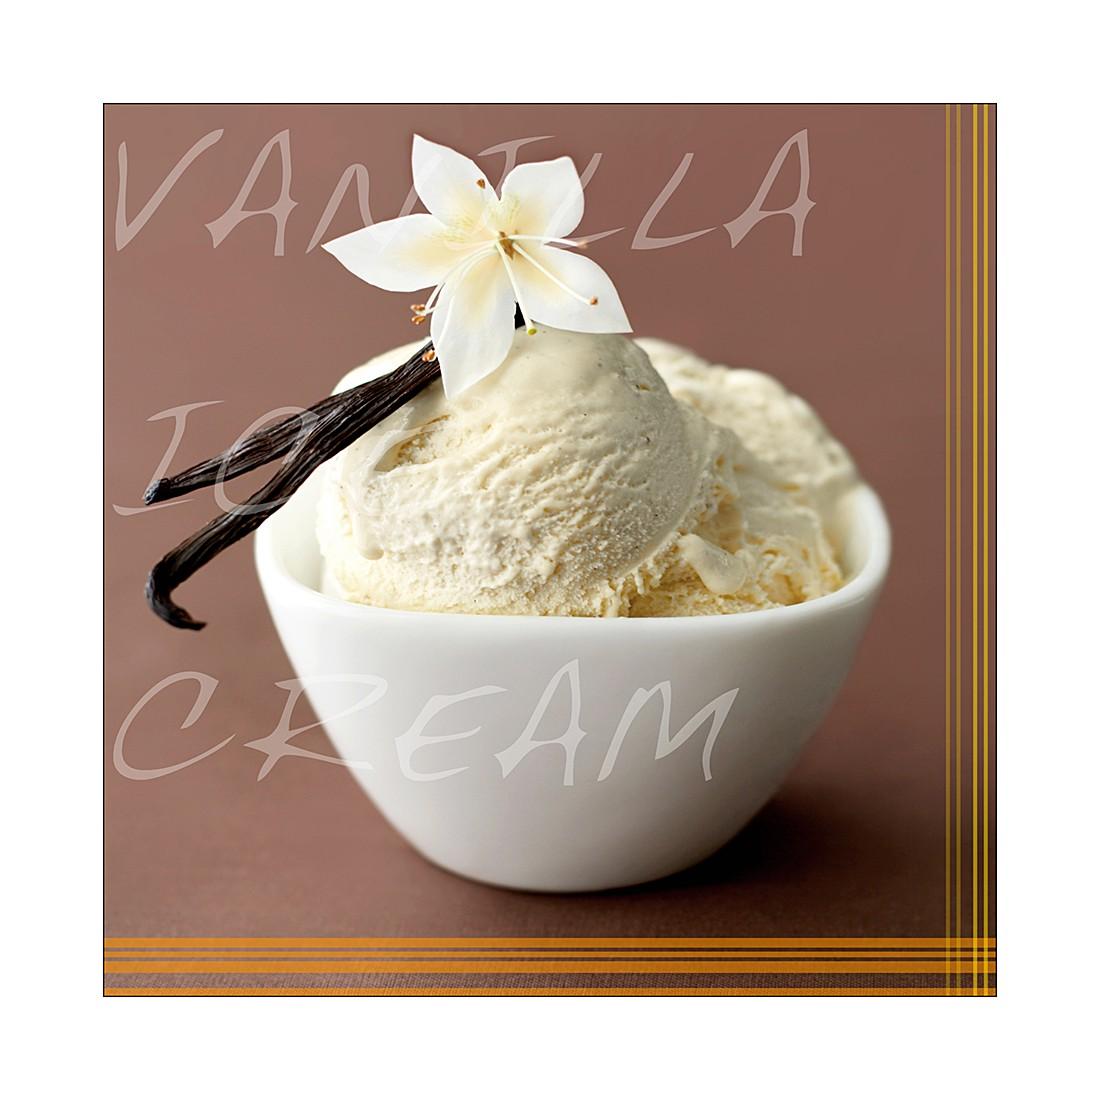 Afbeelding Vanilla Ice Cream - 50x50cm, Pro Art